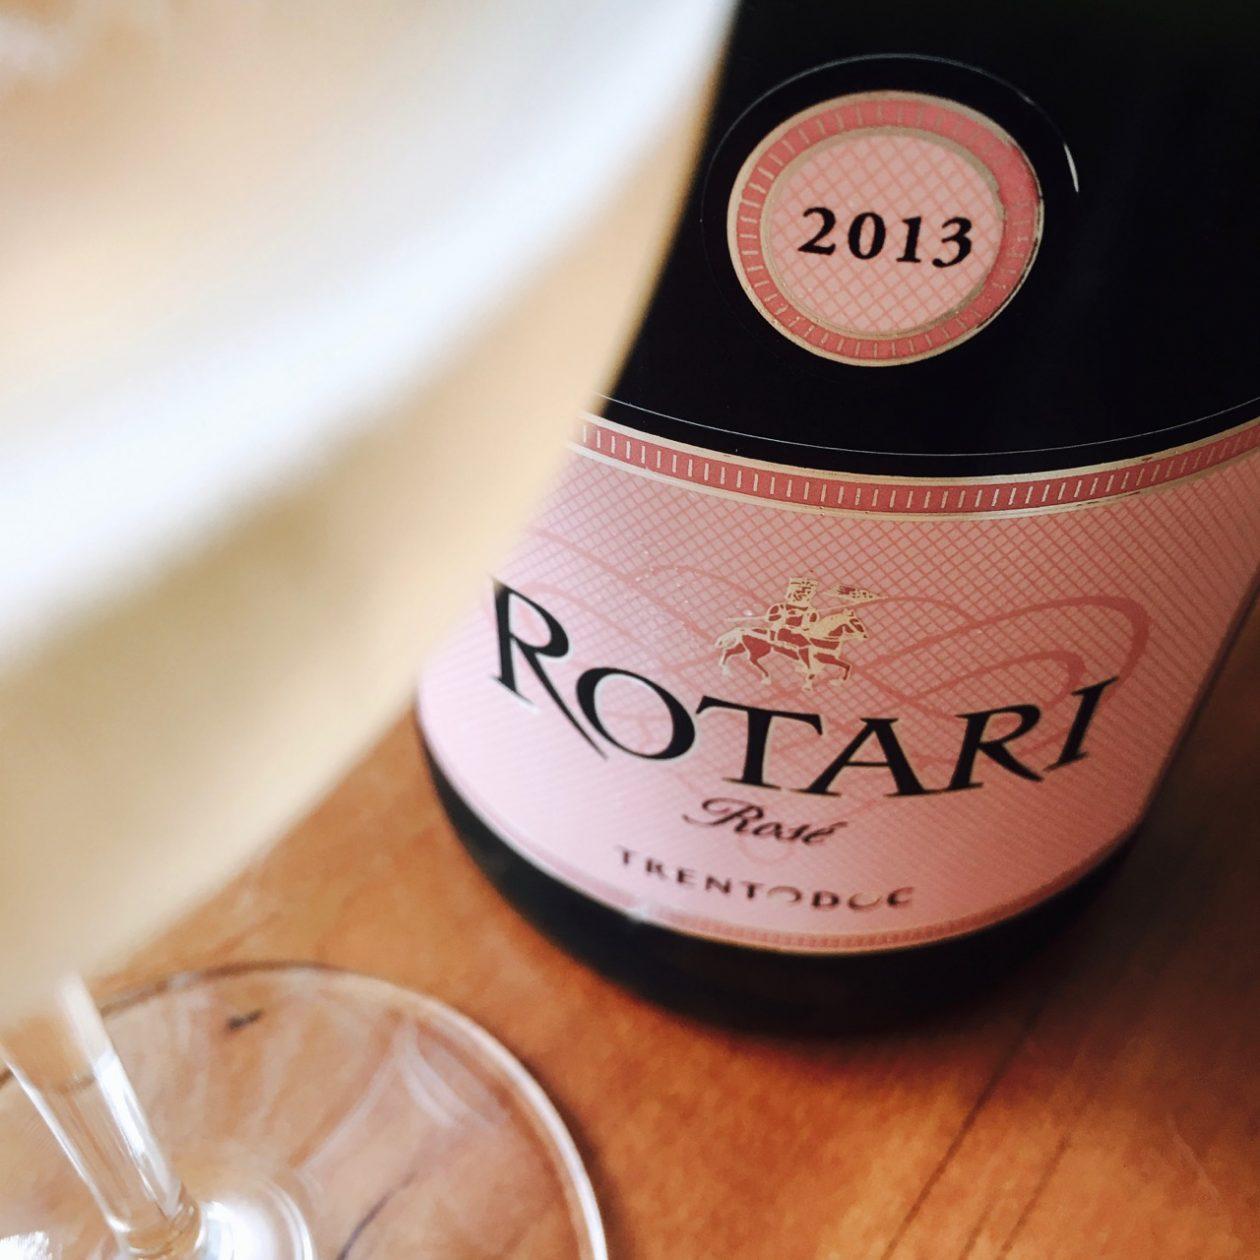 2013 Rotari Brut Rosé Trentodoc